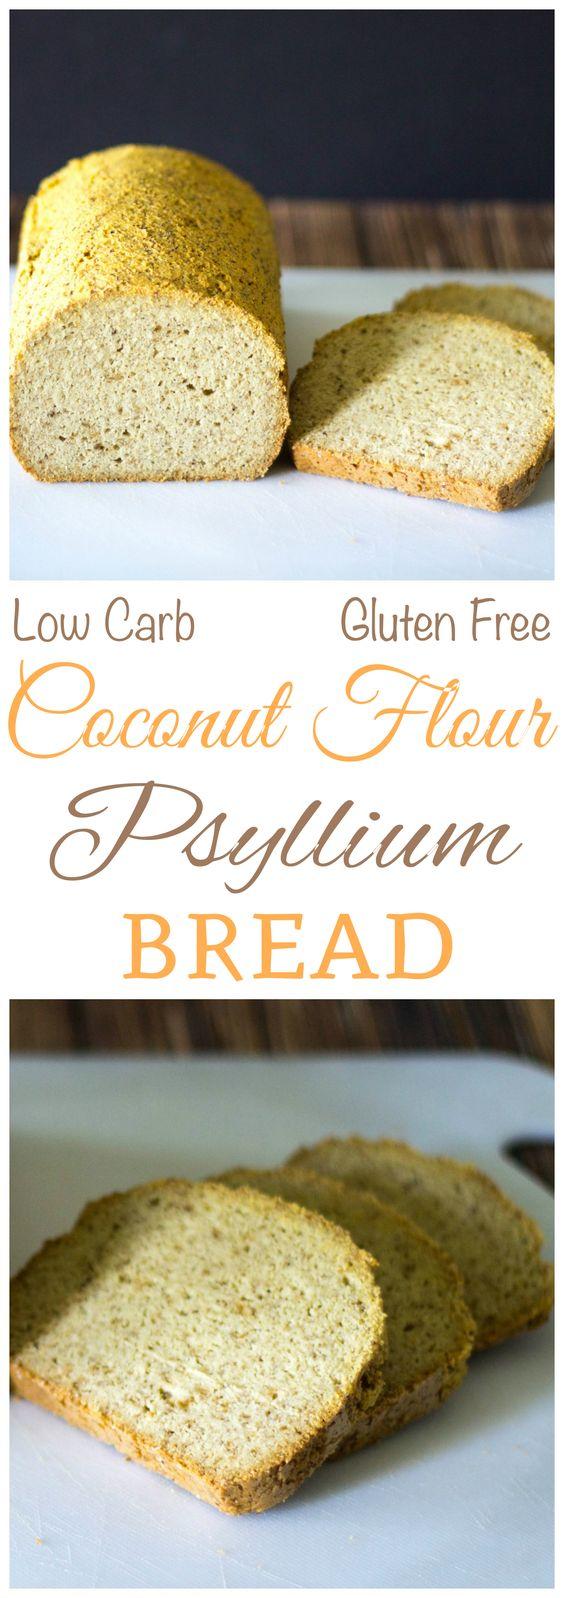 Coconut Flour Psyllium Husk Bread - Top Recipes On The Internet